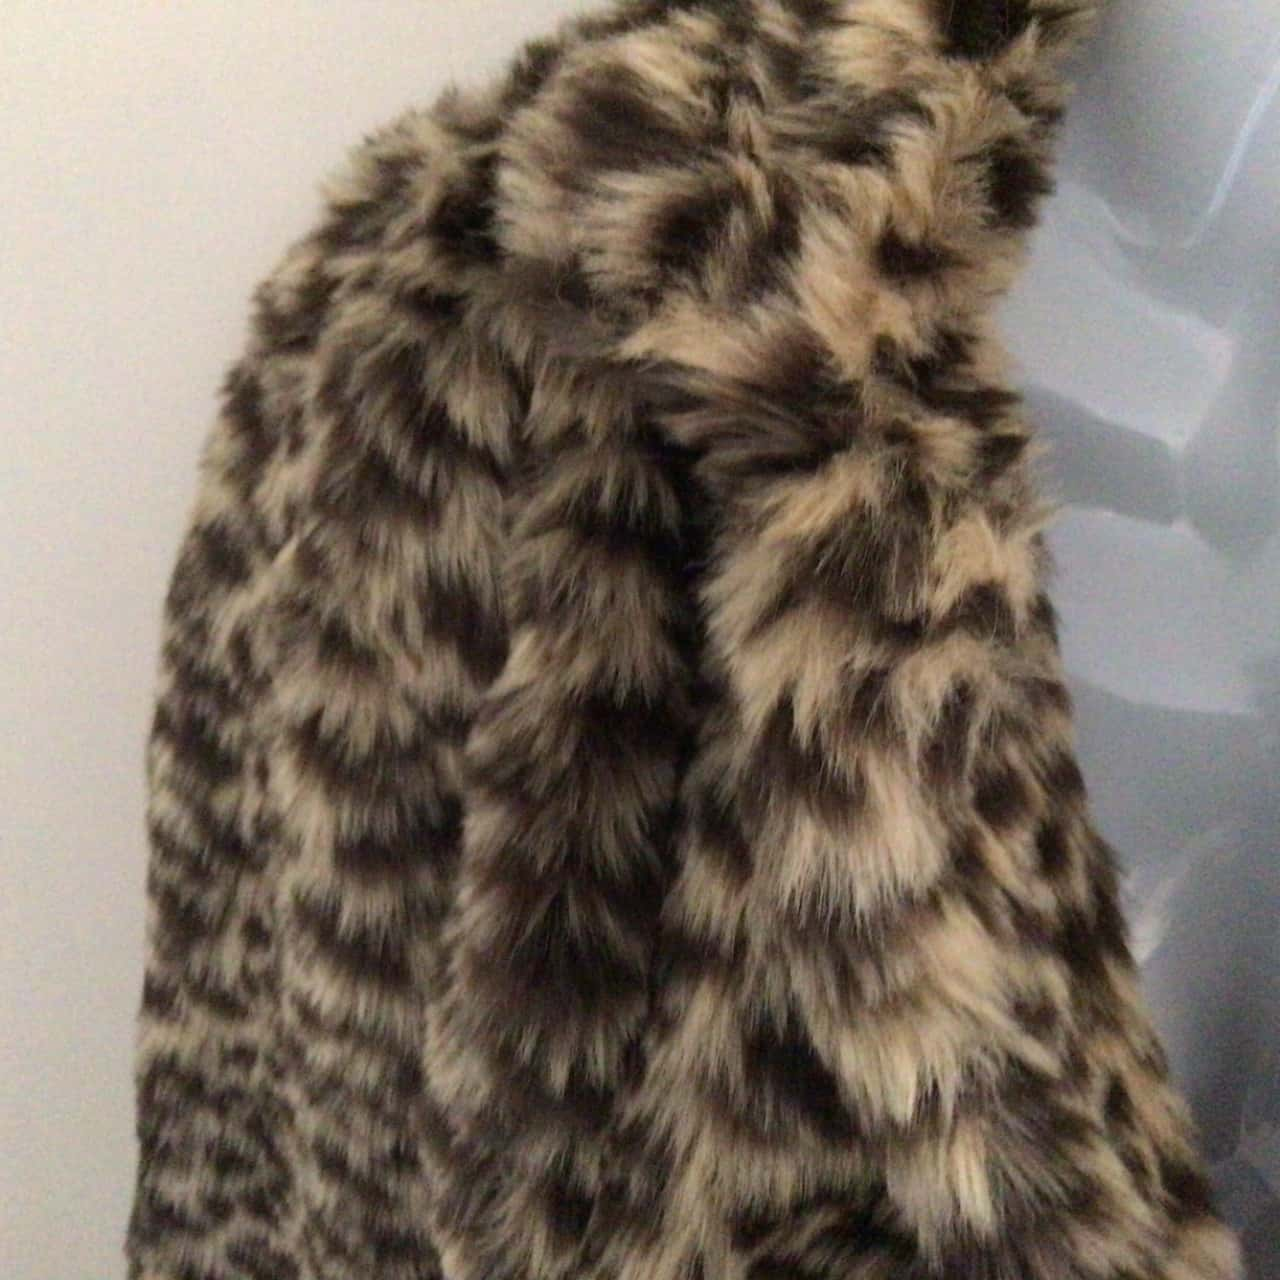 Womens NEXT FAUX FUR JACKET LEOPARD PRINT Size 10 RRP $125 (F£70)